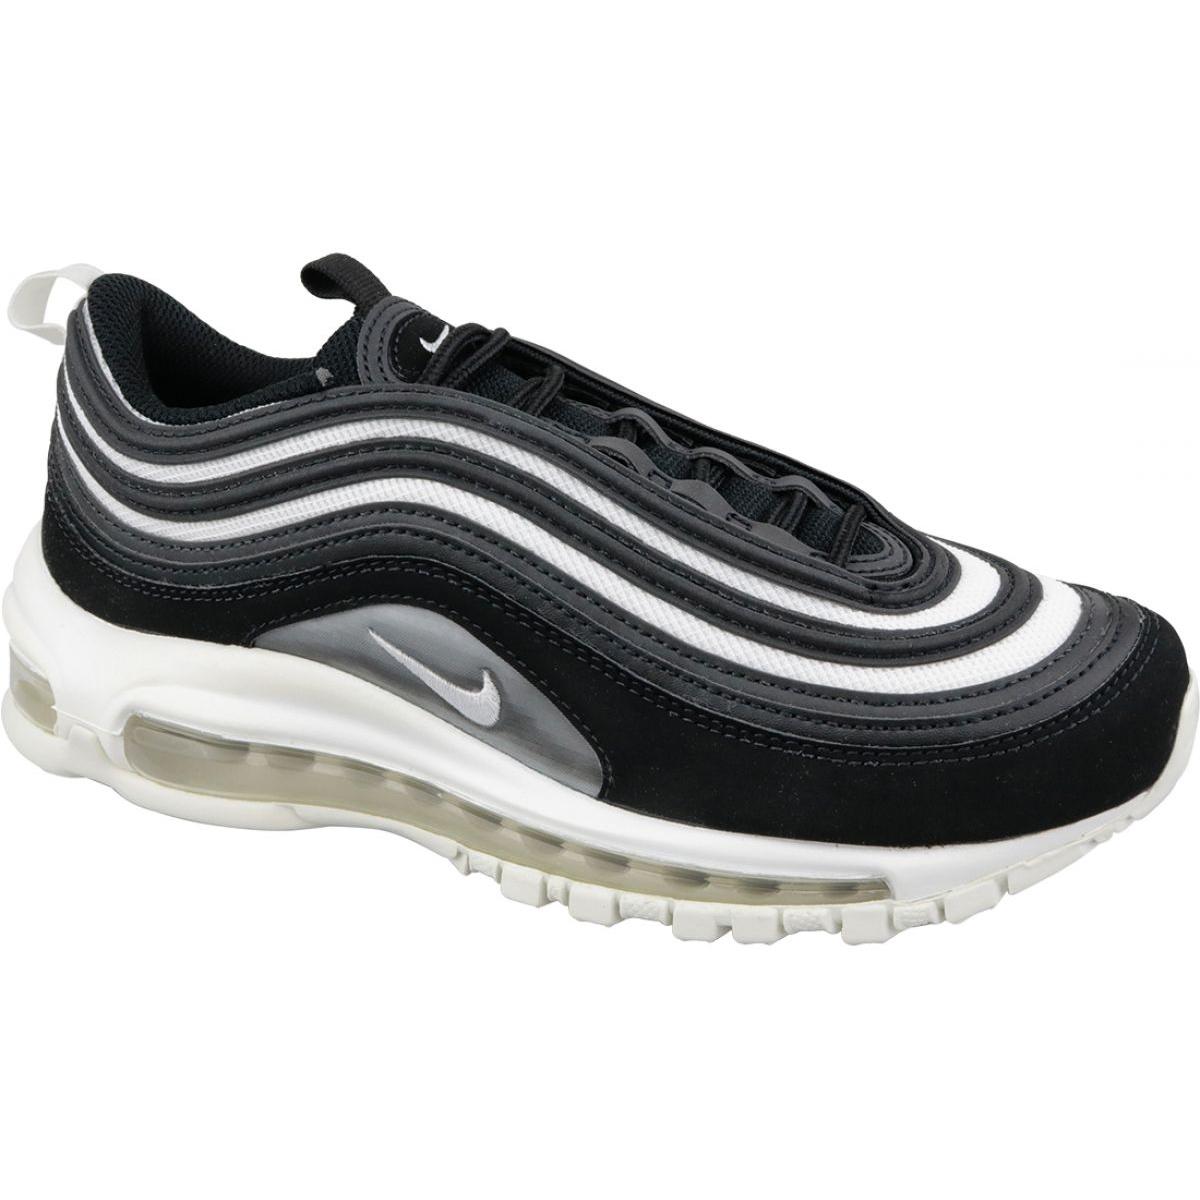 Buty Nike Wmns Air Max 97 W 921733 017 czarne